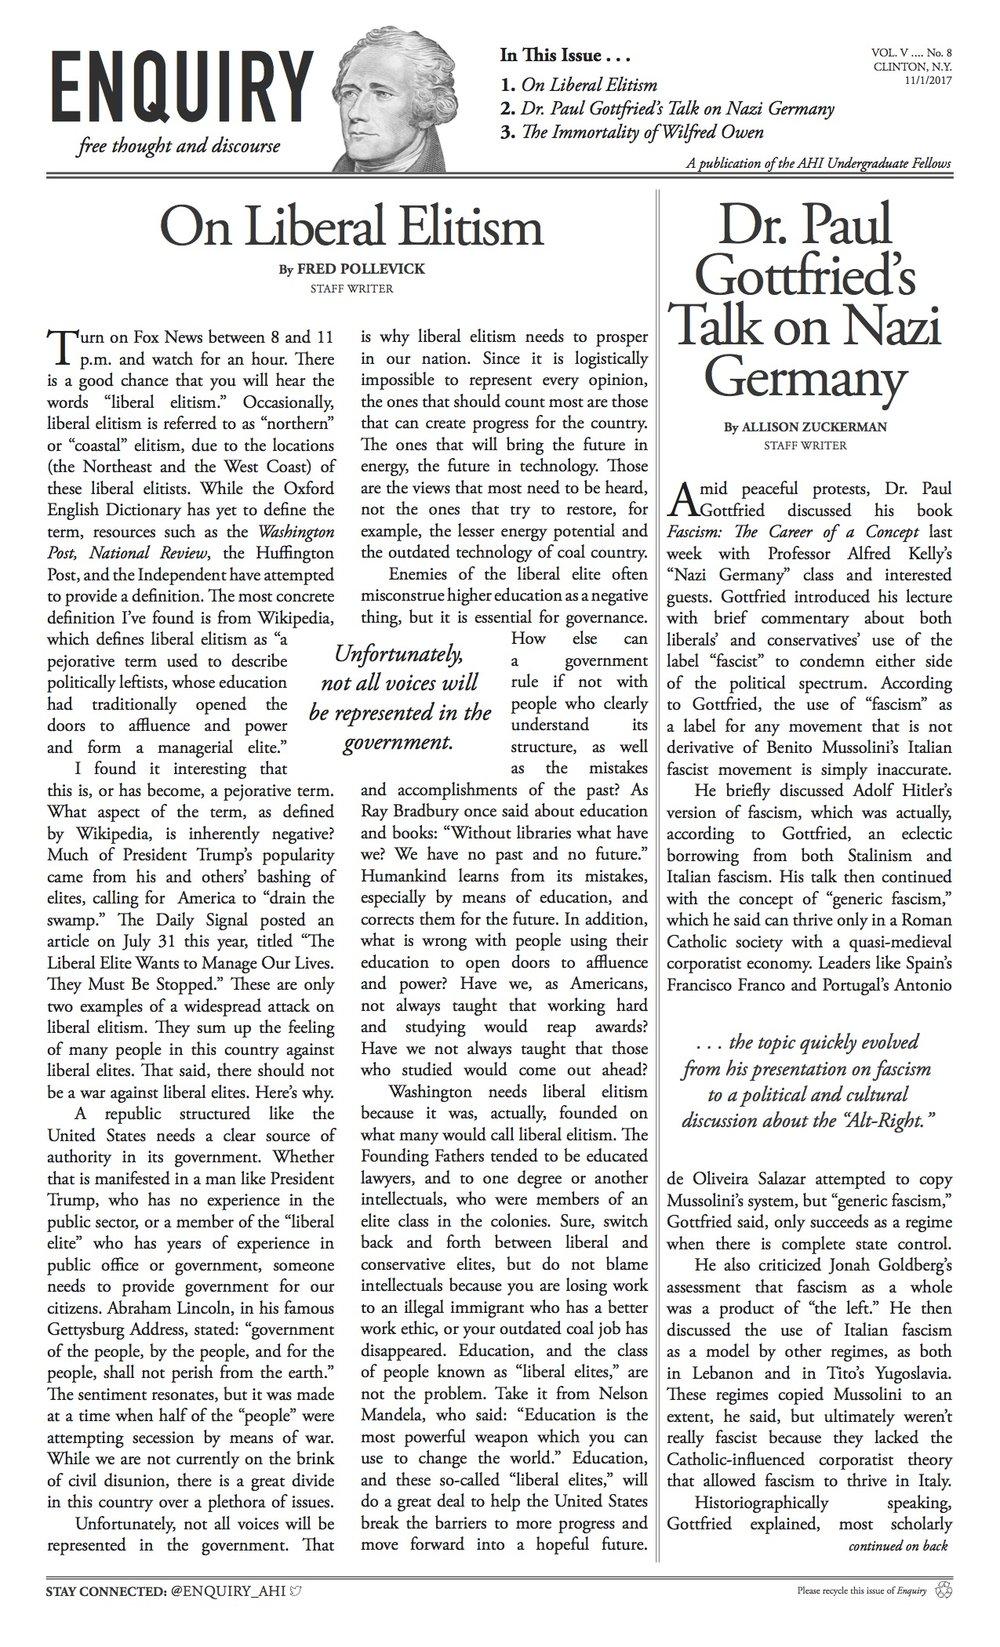 Enquiry Vol 5 No 8 front.jpg